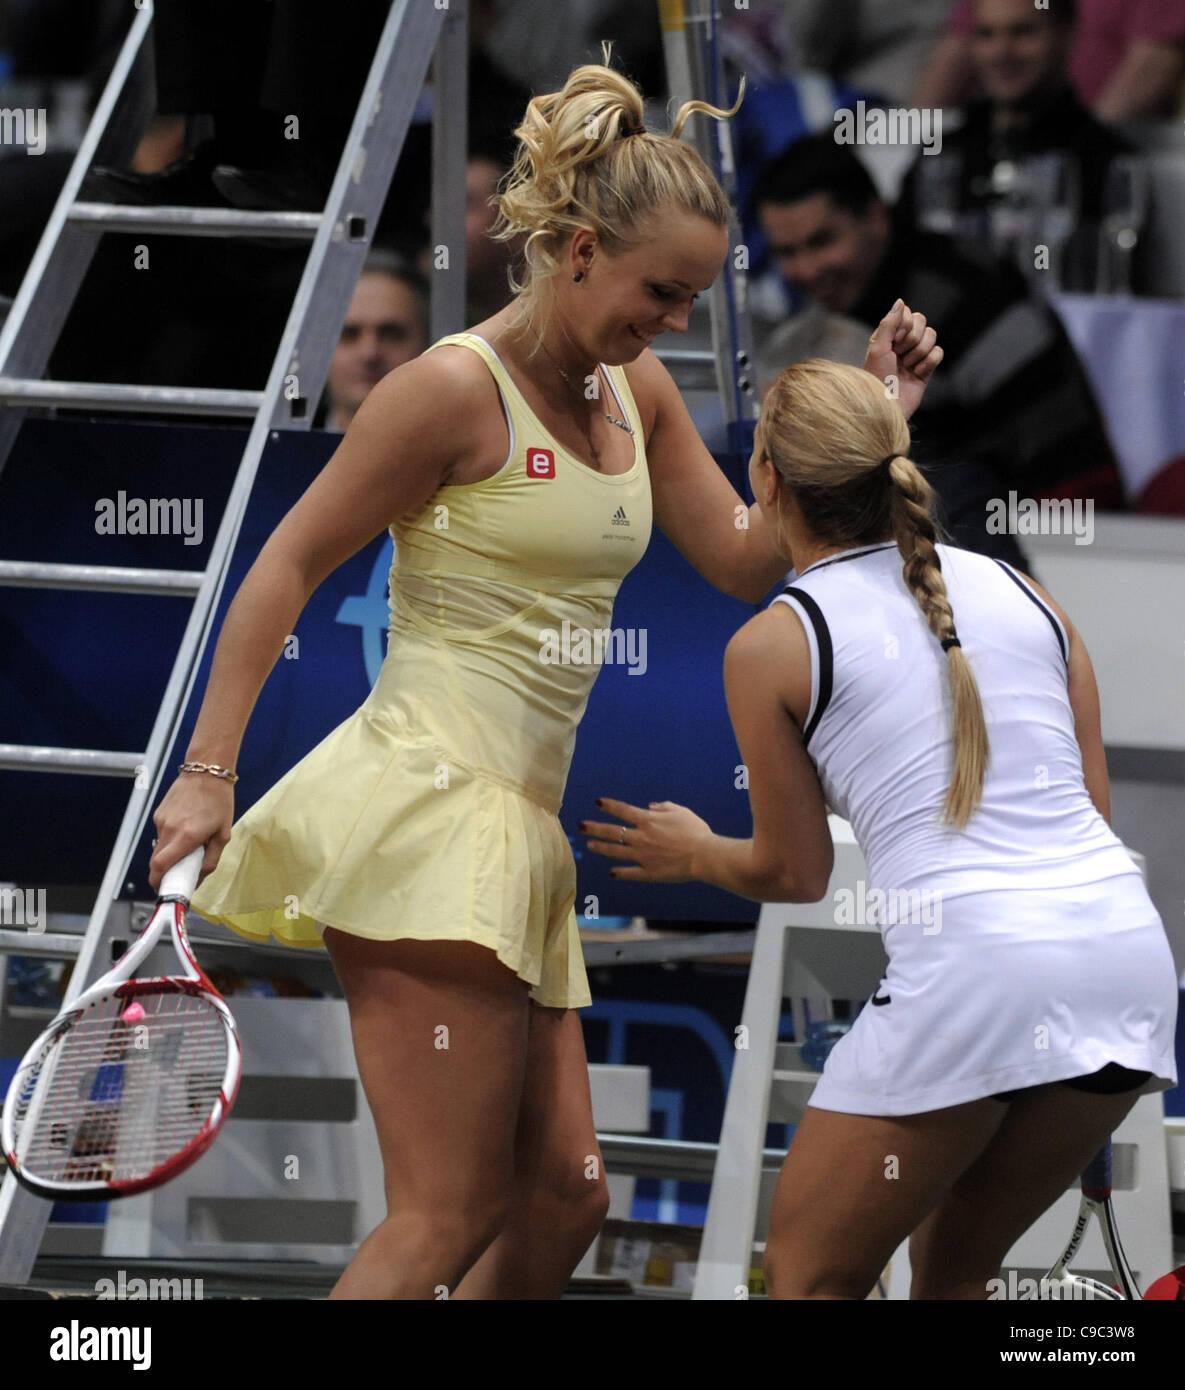 a9511561b112 Denmark s Caroline Wozniacki (left) and Slovak Dominika Cibulkova dance  after the exhibition match Tennis